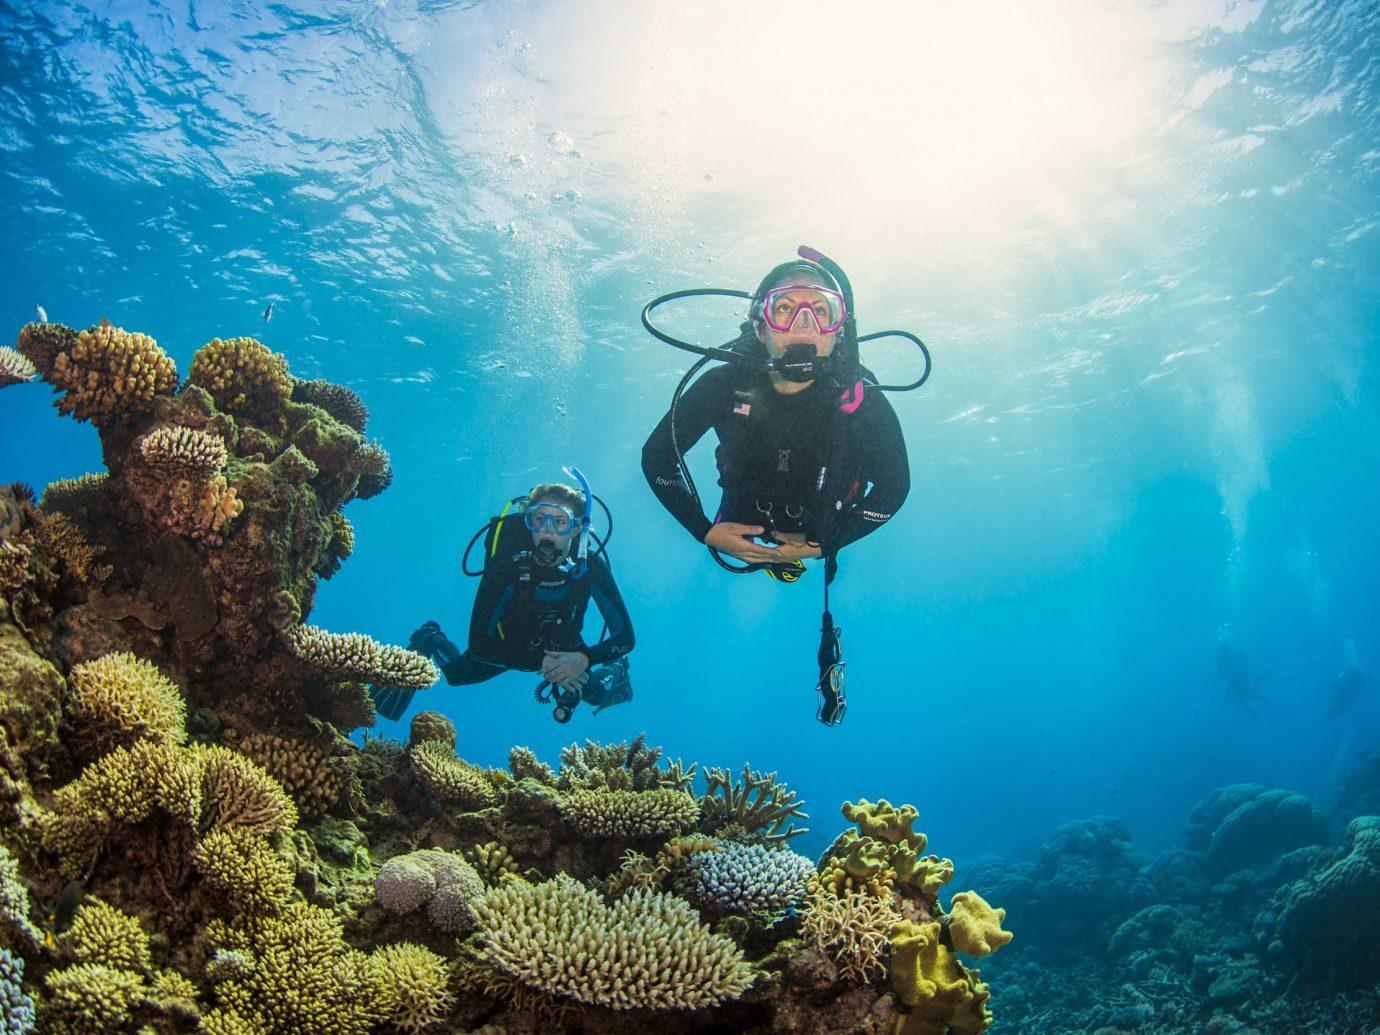 Health + Wellness Scuba Diving + Snorkeling Trip Ideas Scuba Diving marine biology underwater diving coral reef sports reef diving underwater biology water sport outdoor recreation recreation Sea swimming ocean floor